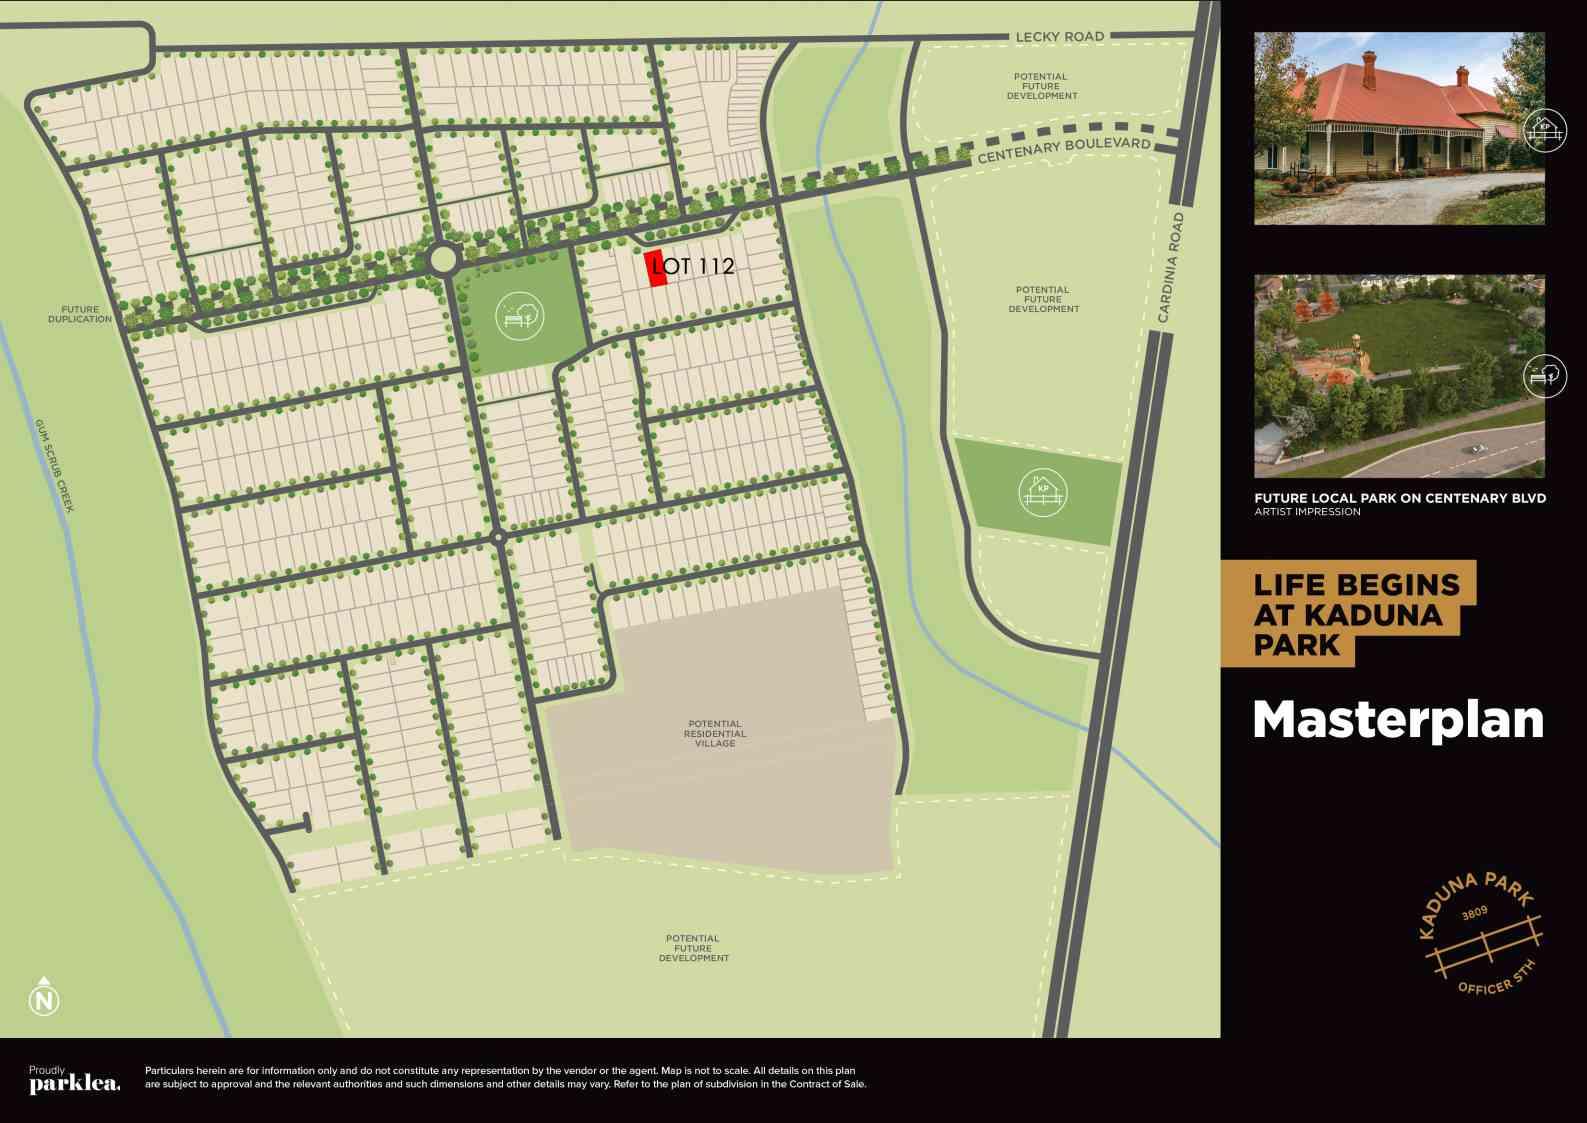 Kaduna Park Masterplan